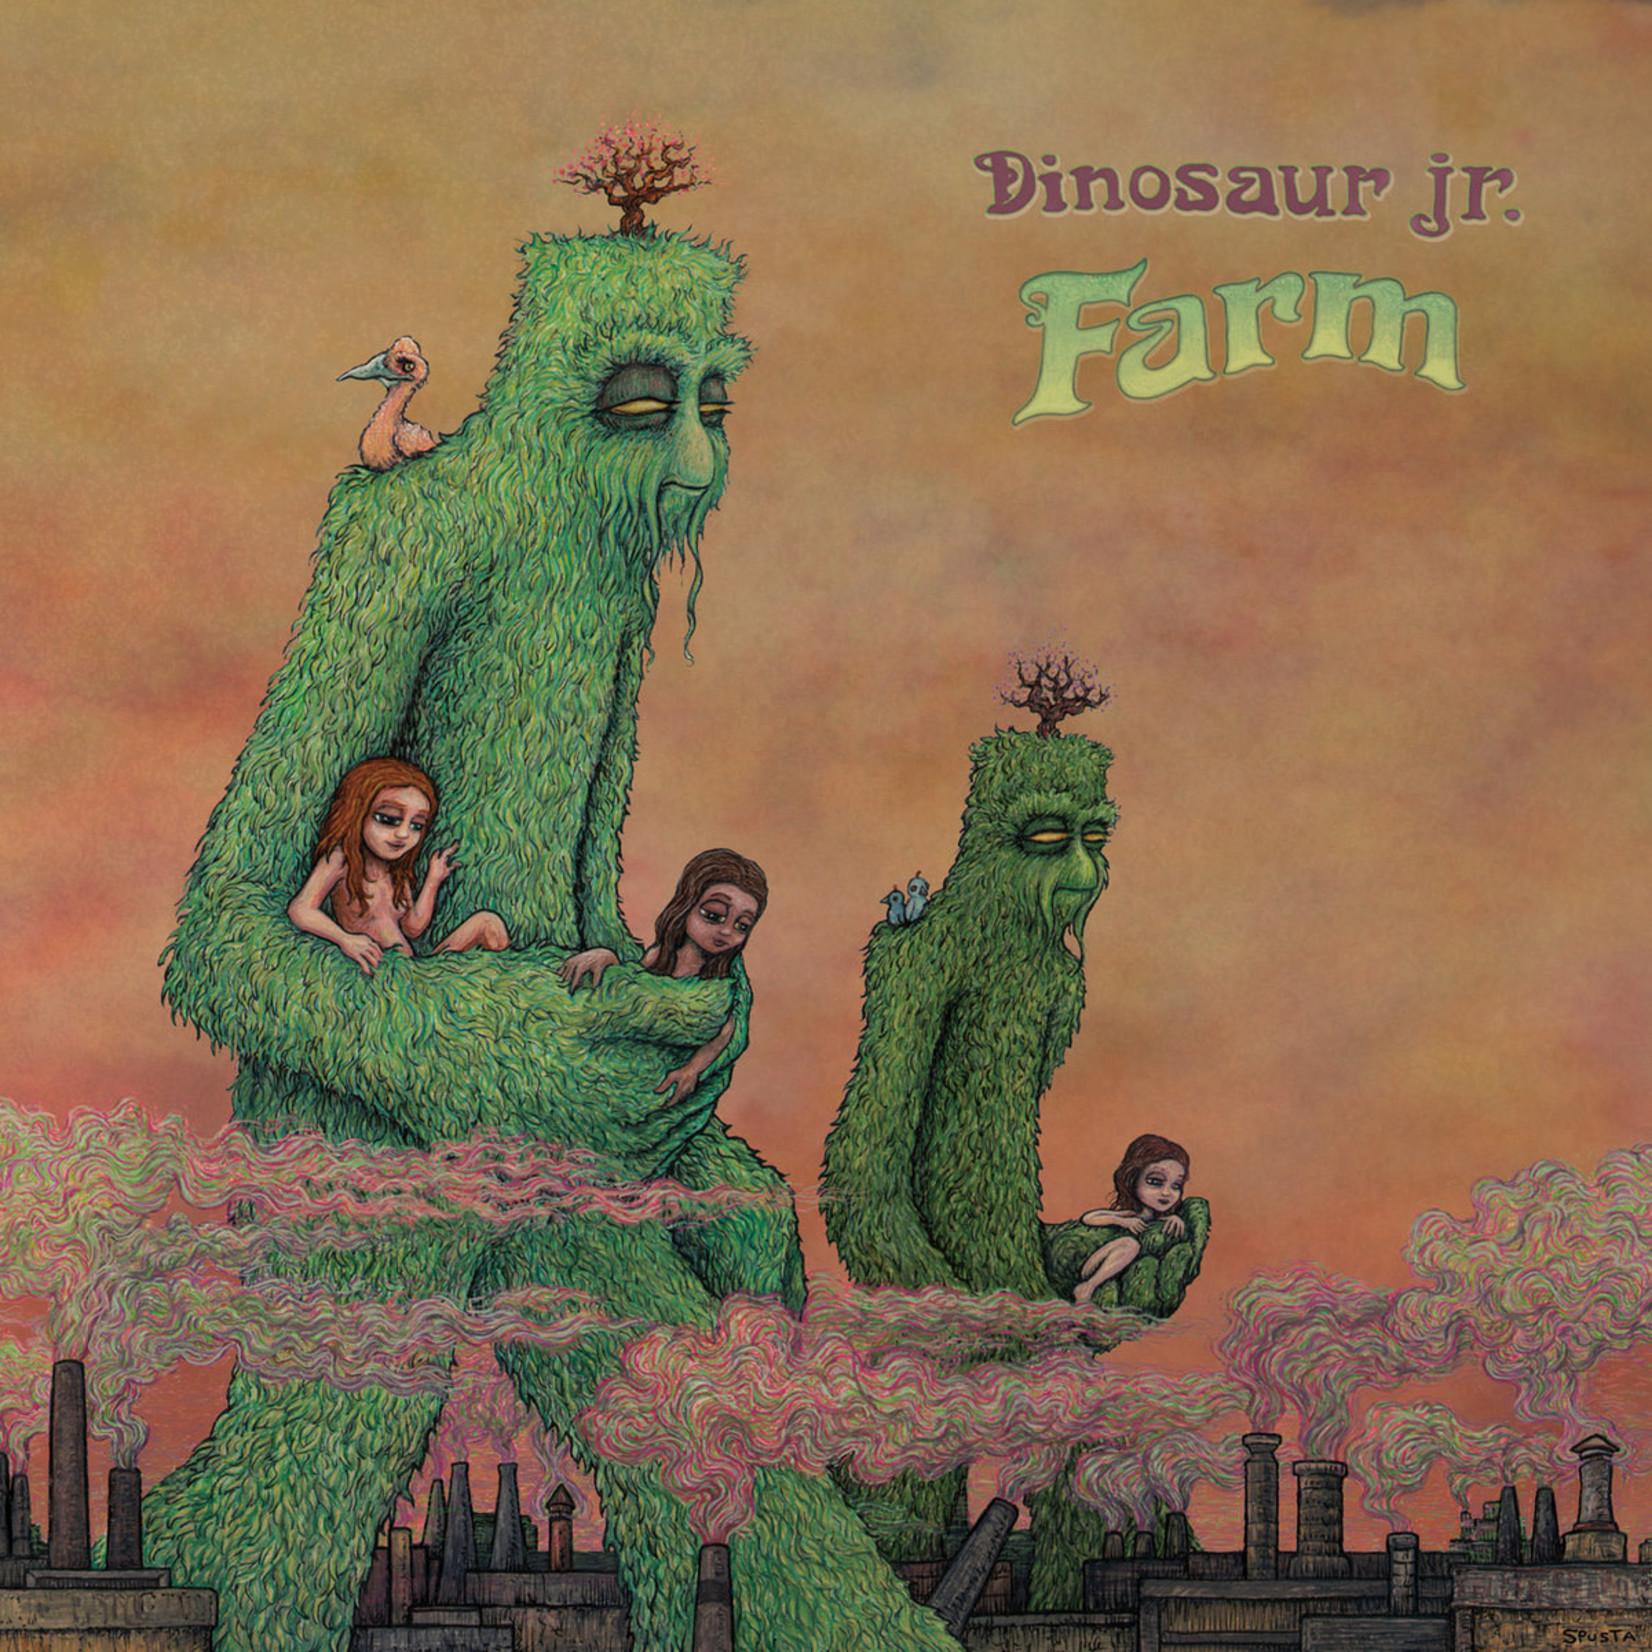 [New] Dinosaur Jr.: Farm (2LP)